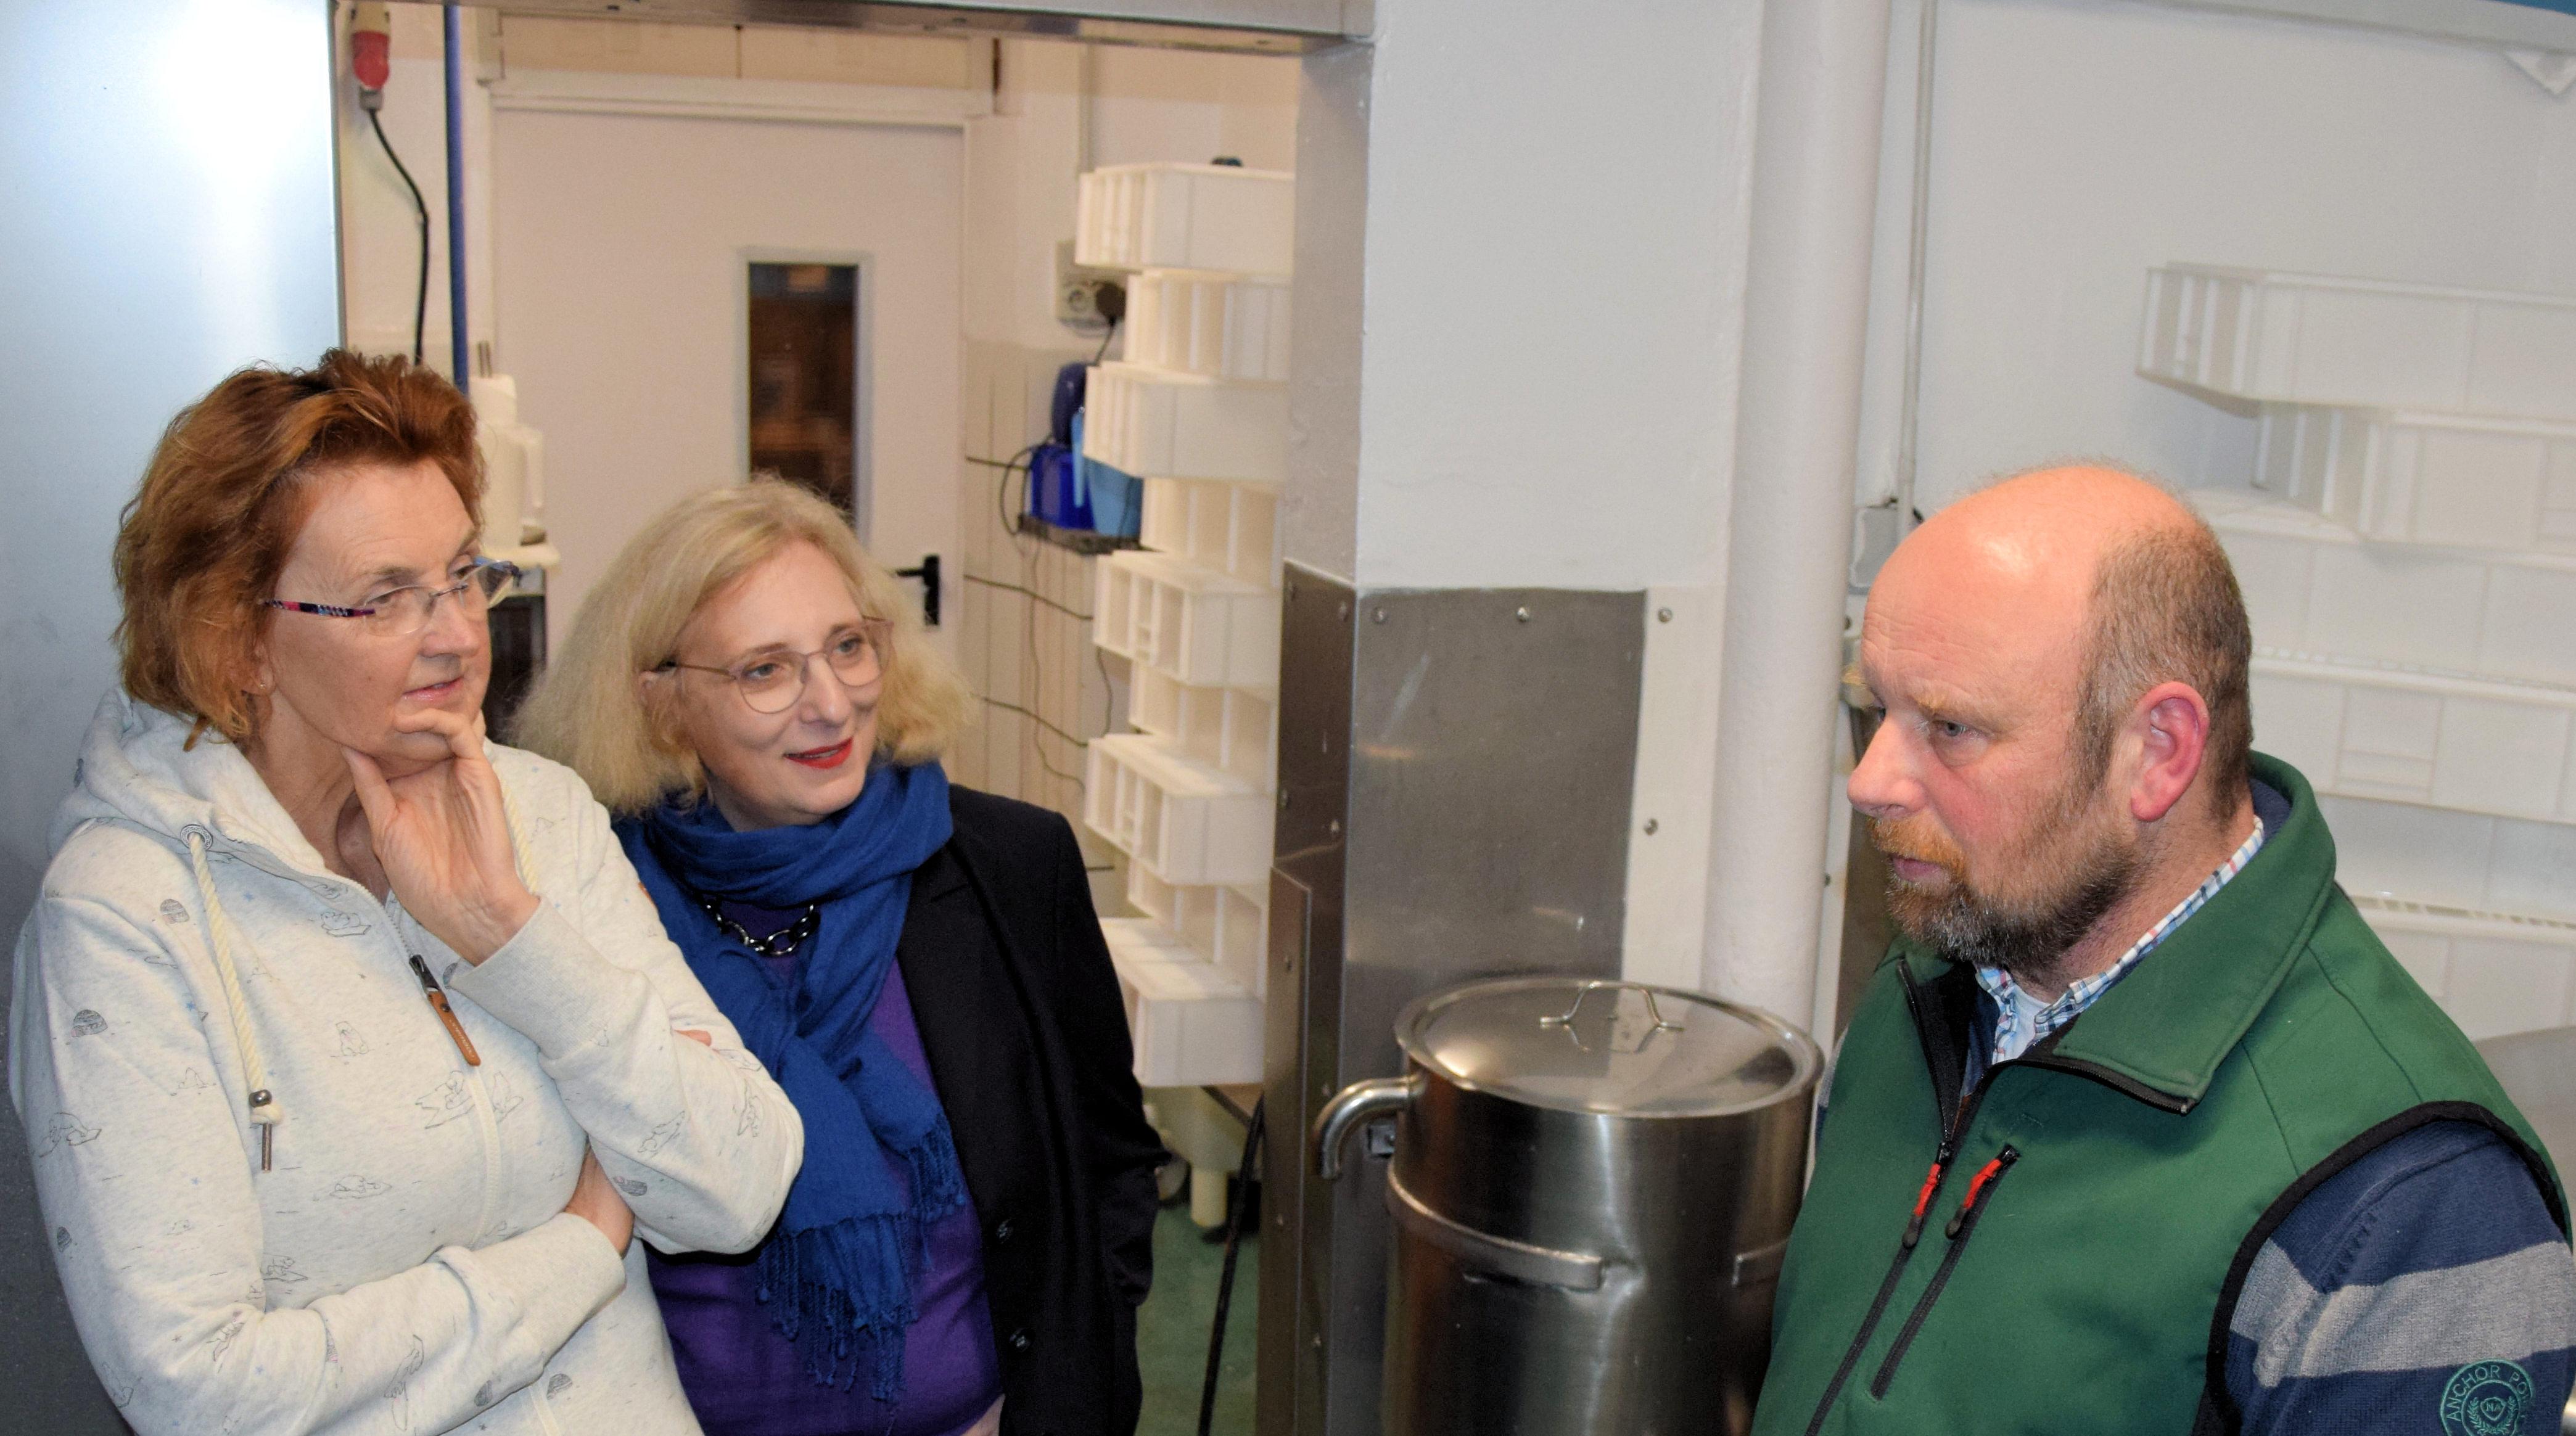 V.l.n.r.: Susanne Mittag, Dr. Daniela De Ridder und Dirk Dennemann